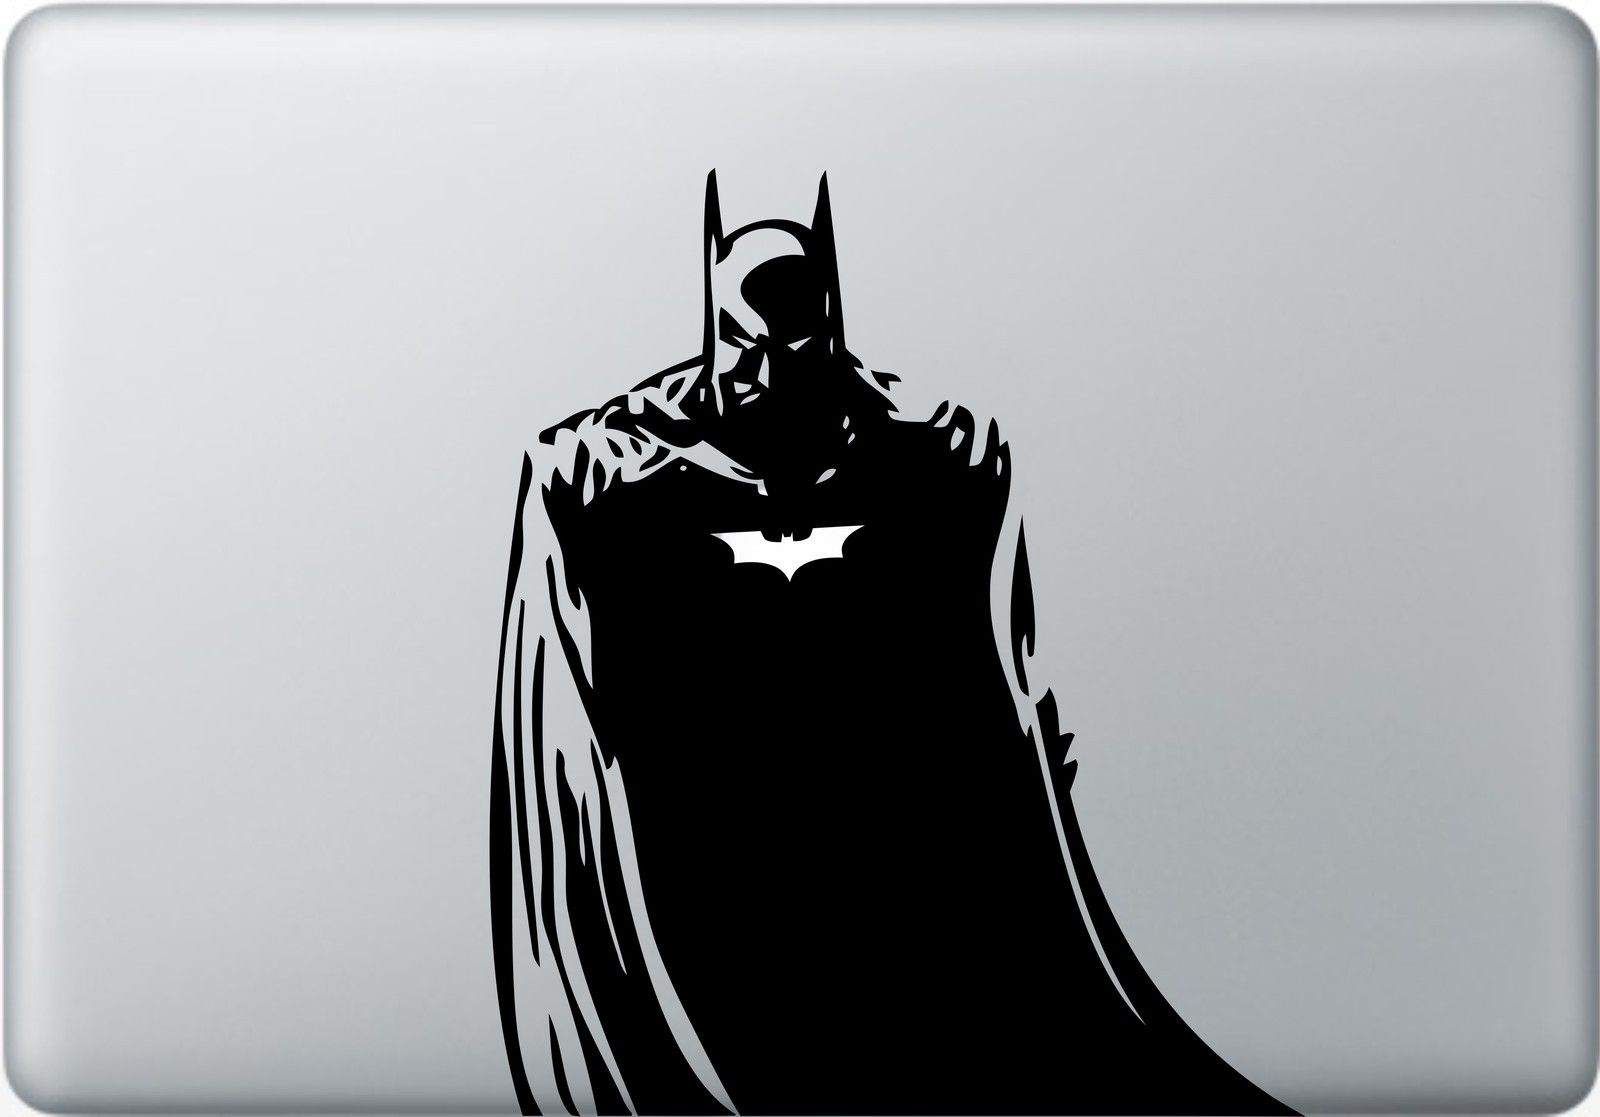 Batman Macbook Sticker Qrioh Macbook Decals Pinterest - Batman vinyl decal stickers